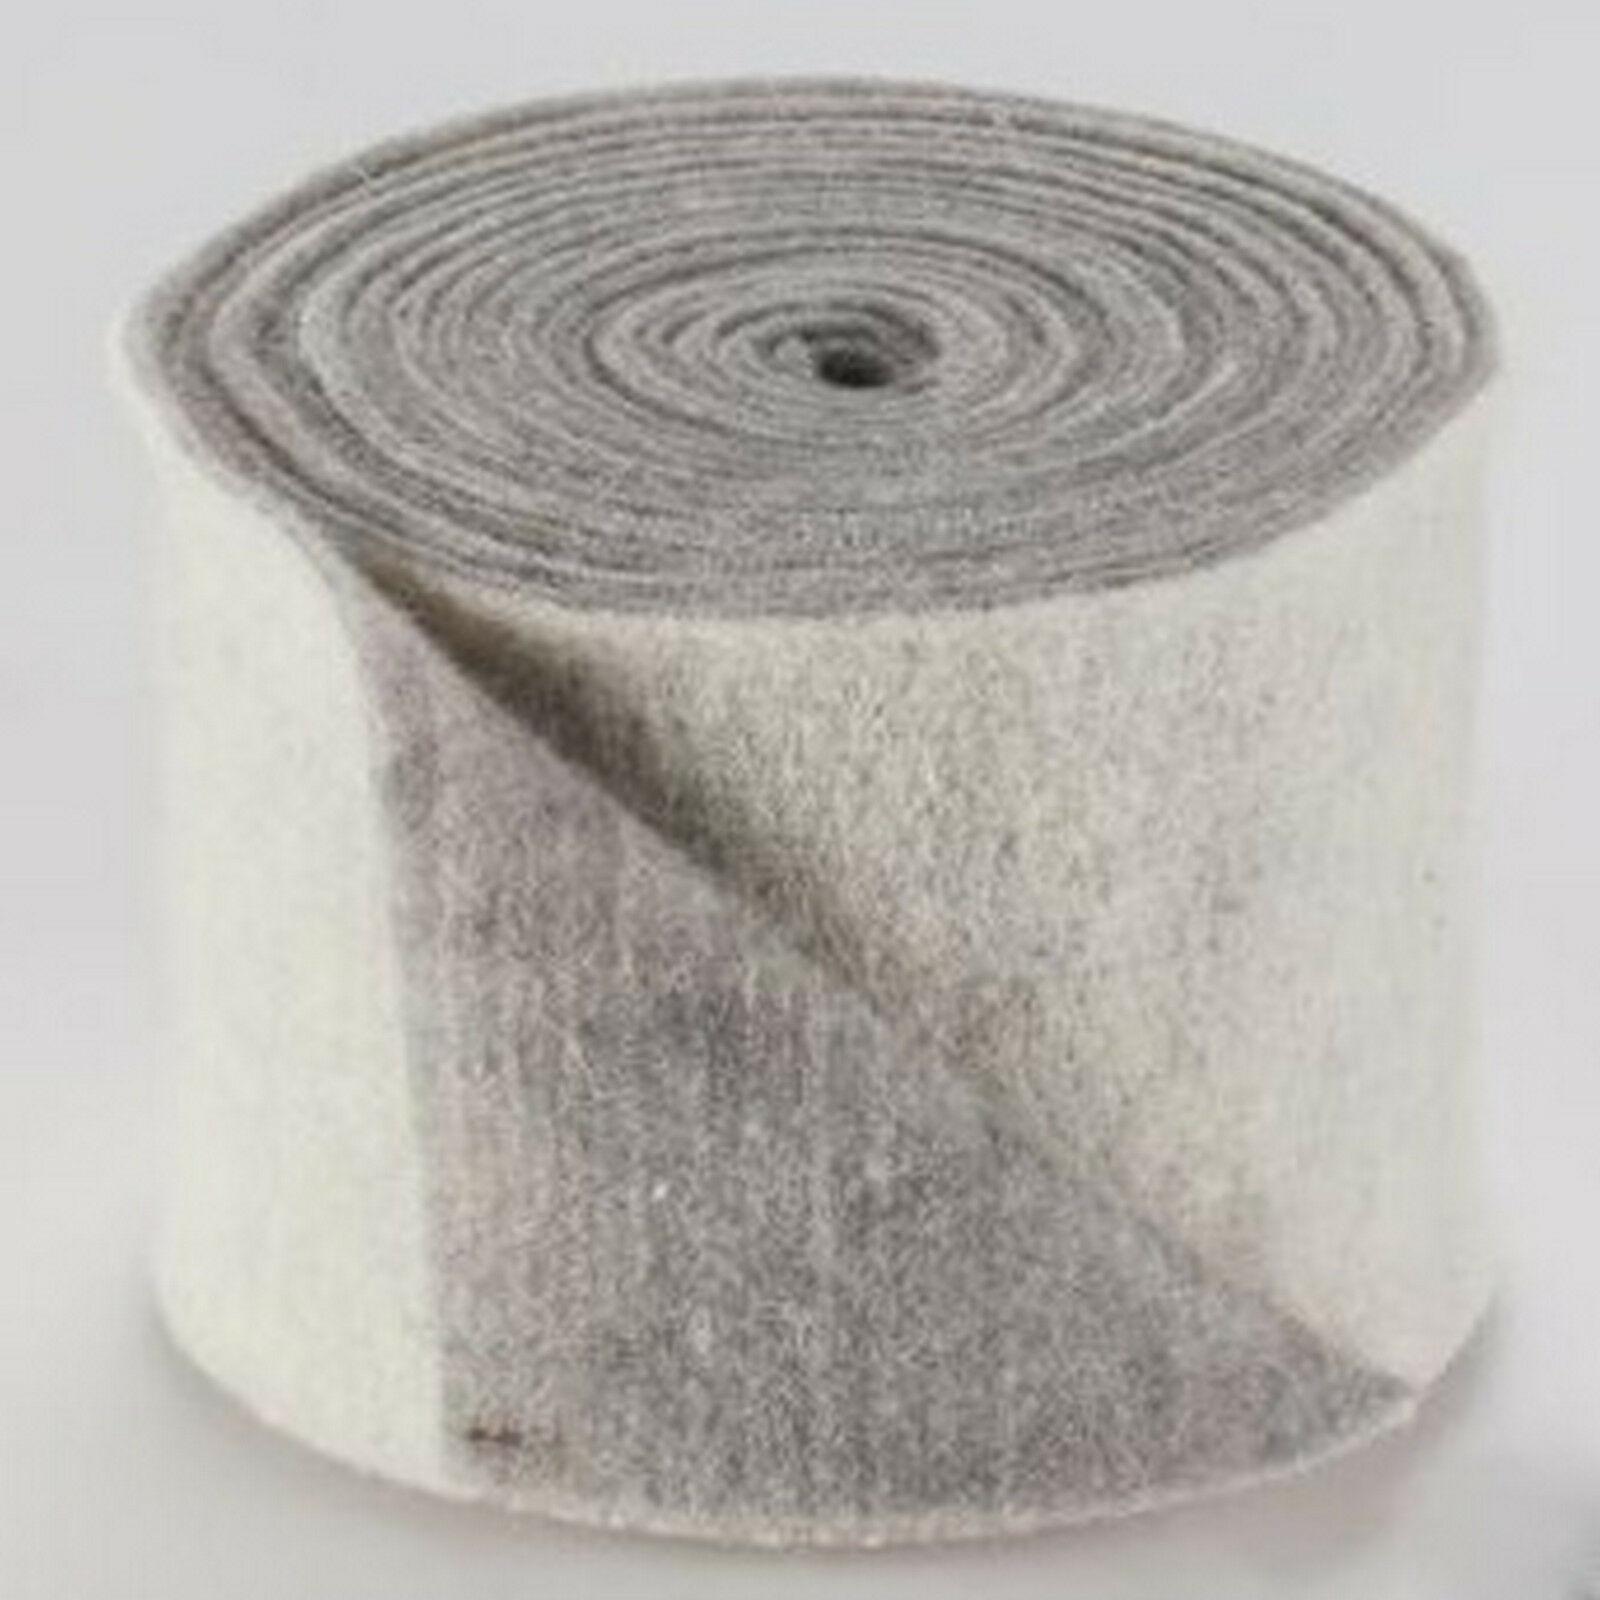 Topfband Filz 5 m x 15 cm zwei-farbige Dekoband Wollvlies Filz-Band Wollband  - weiß-grau